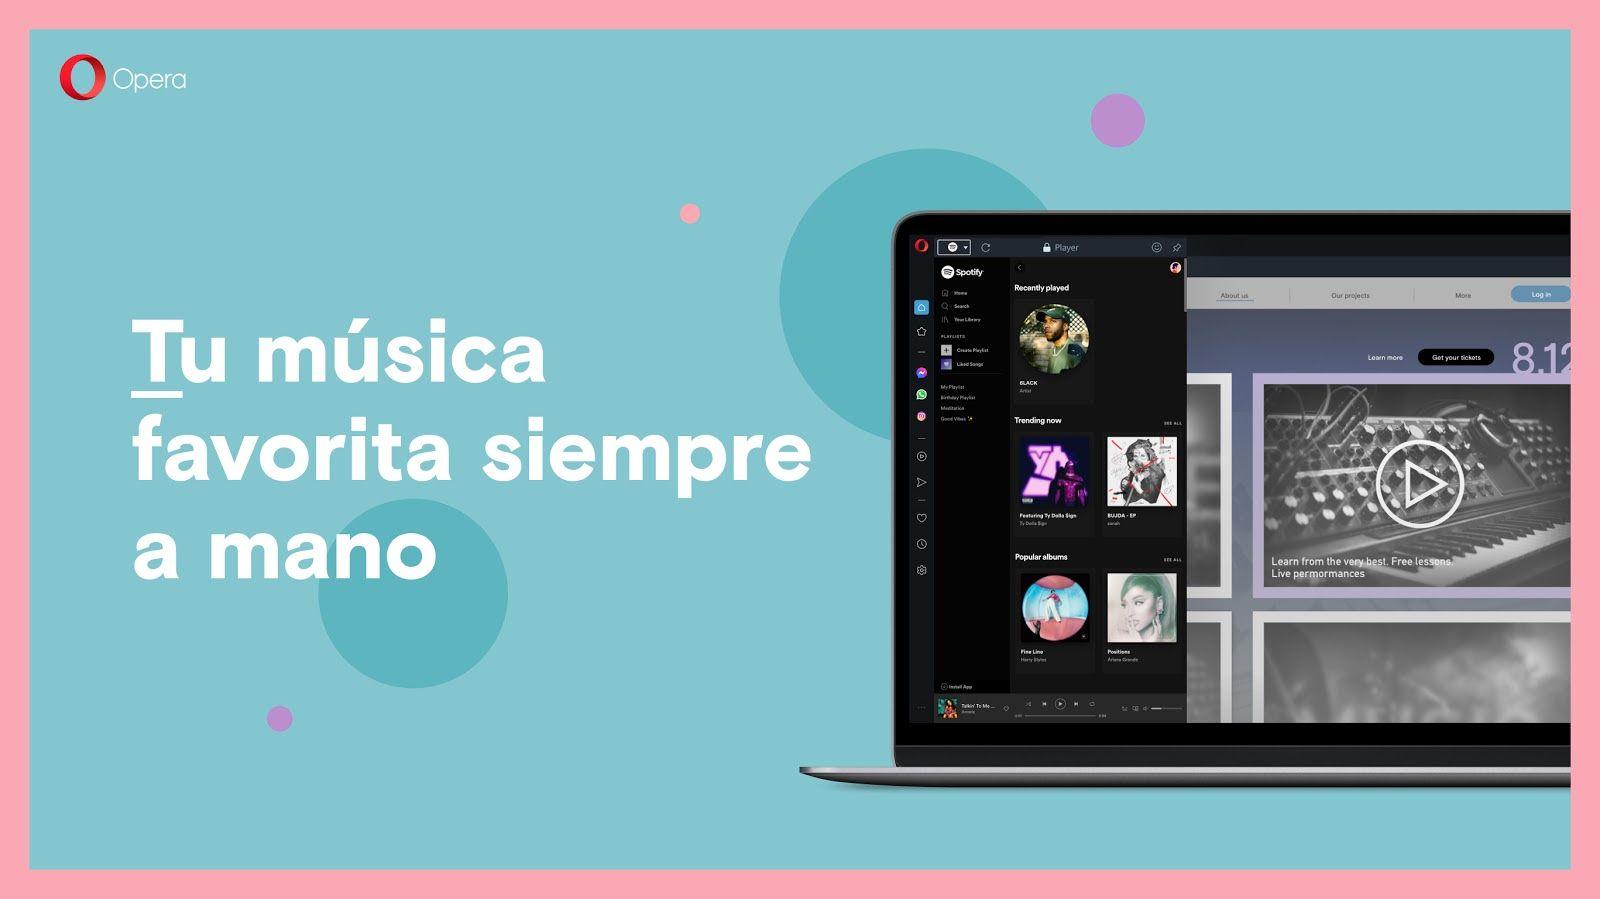 Foto de Opera incorpora a su navegador accesos directos a Spotify,